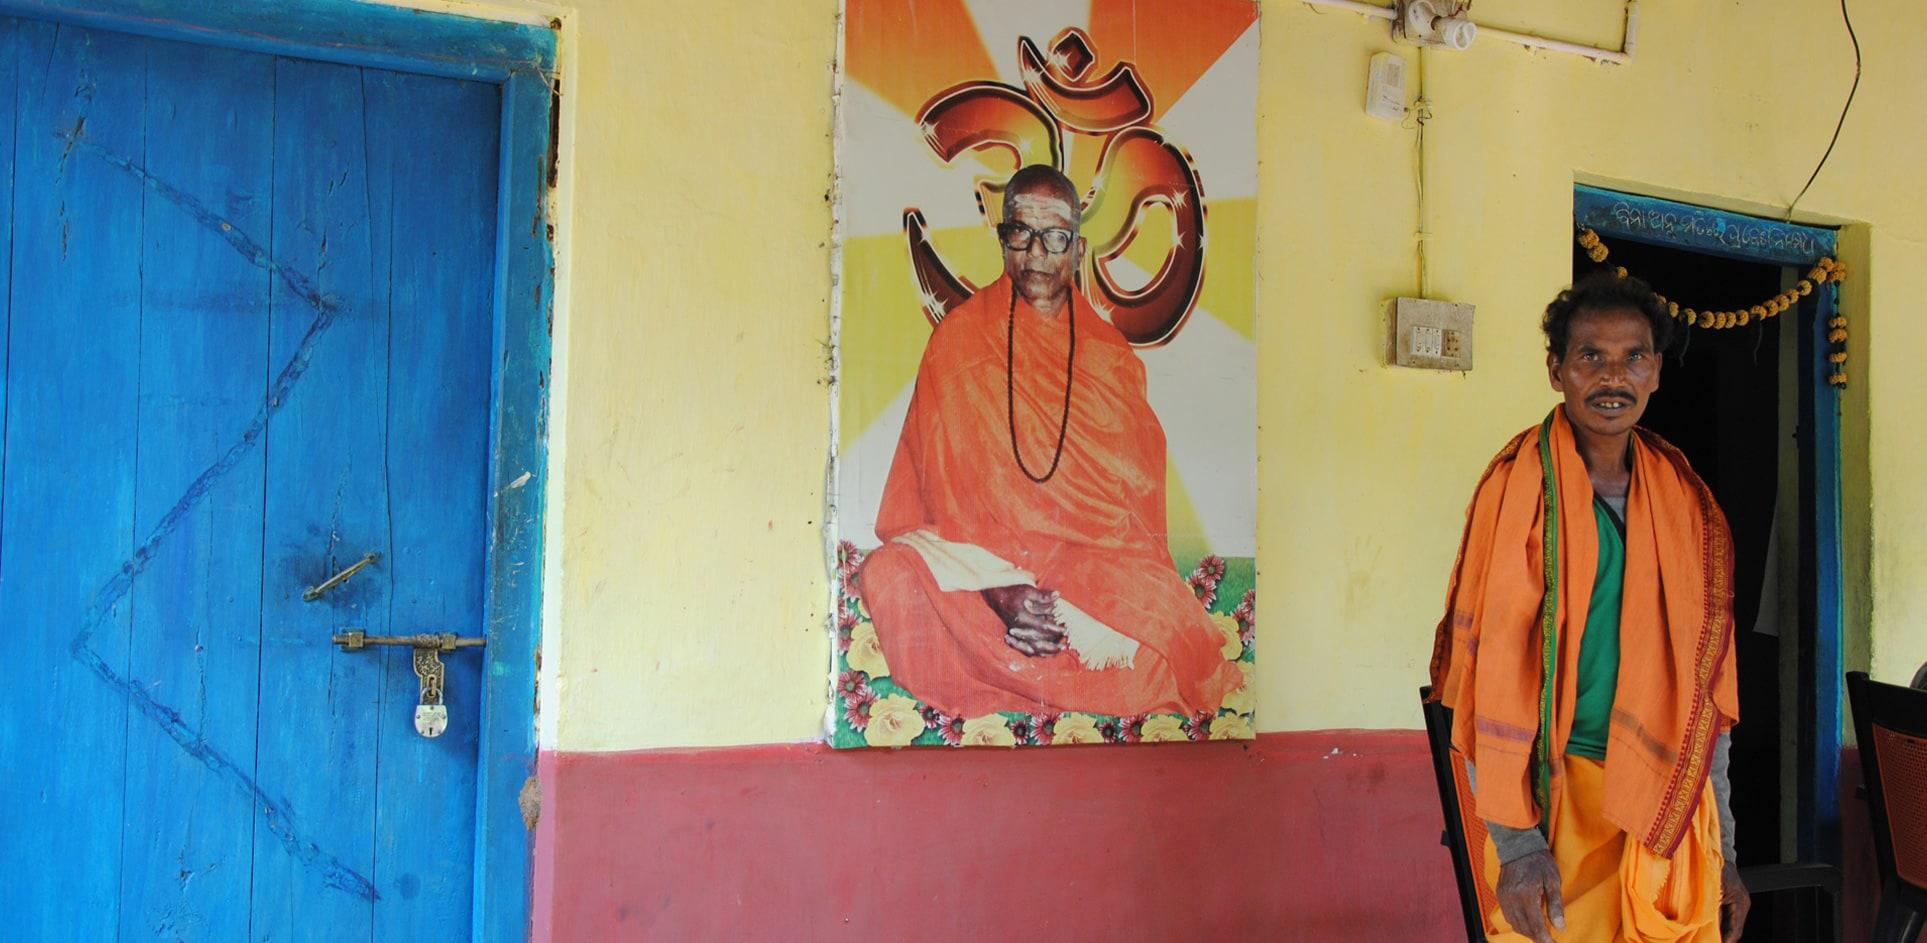 8 years after Swami Laxmanananda Saraswati's killing, Kandhamal is still a ticking time bomb